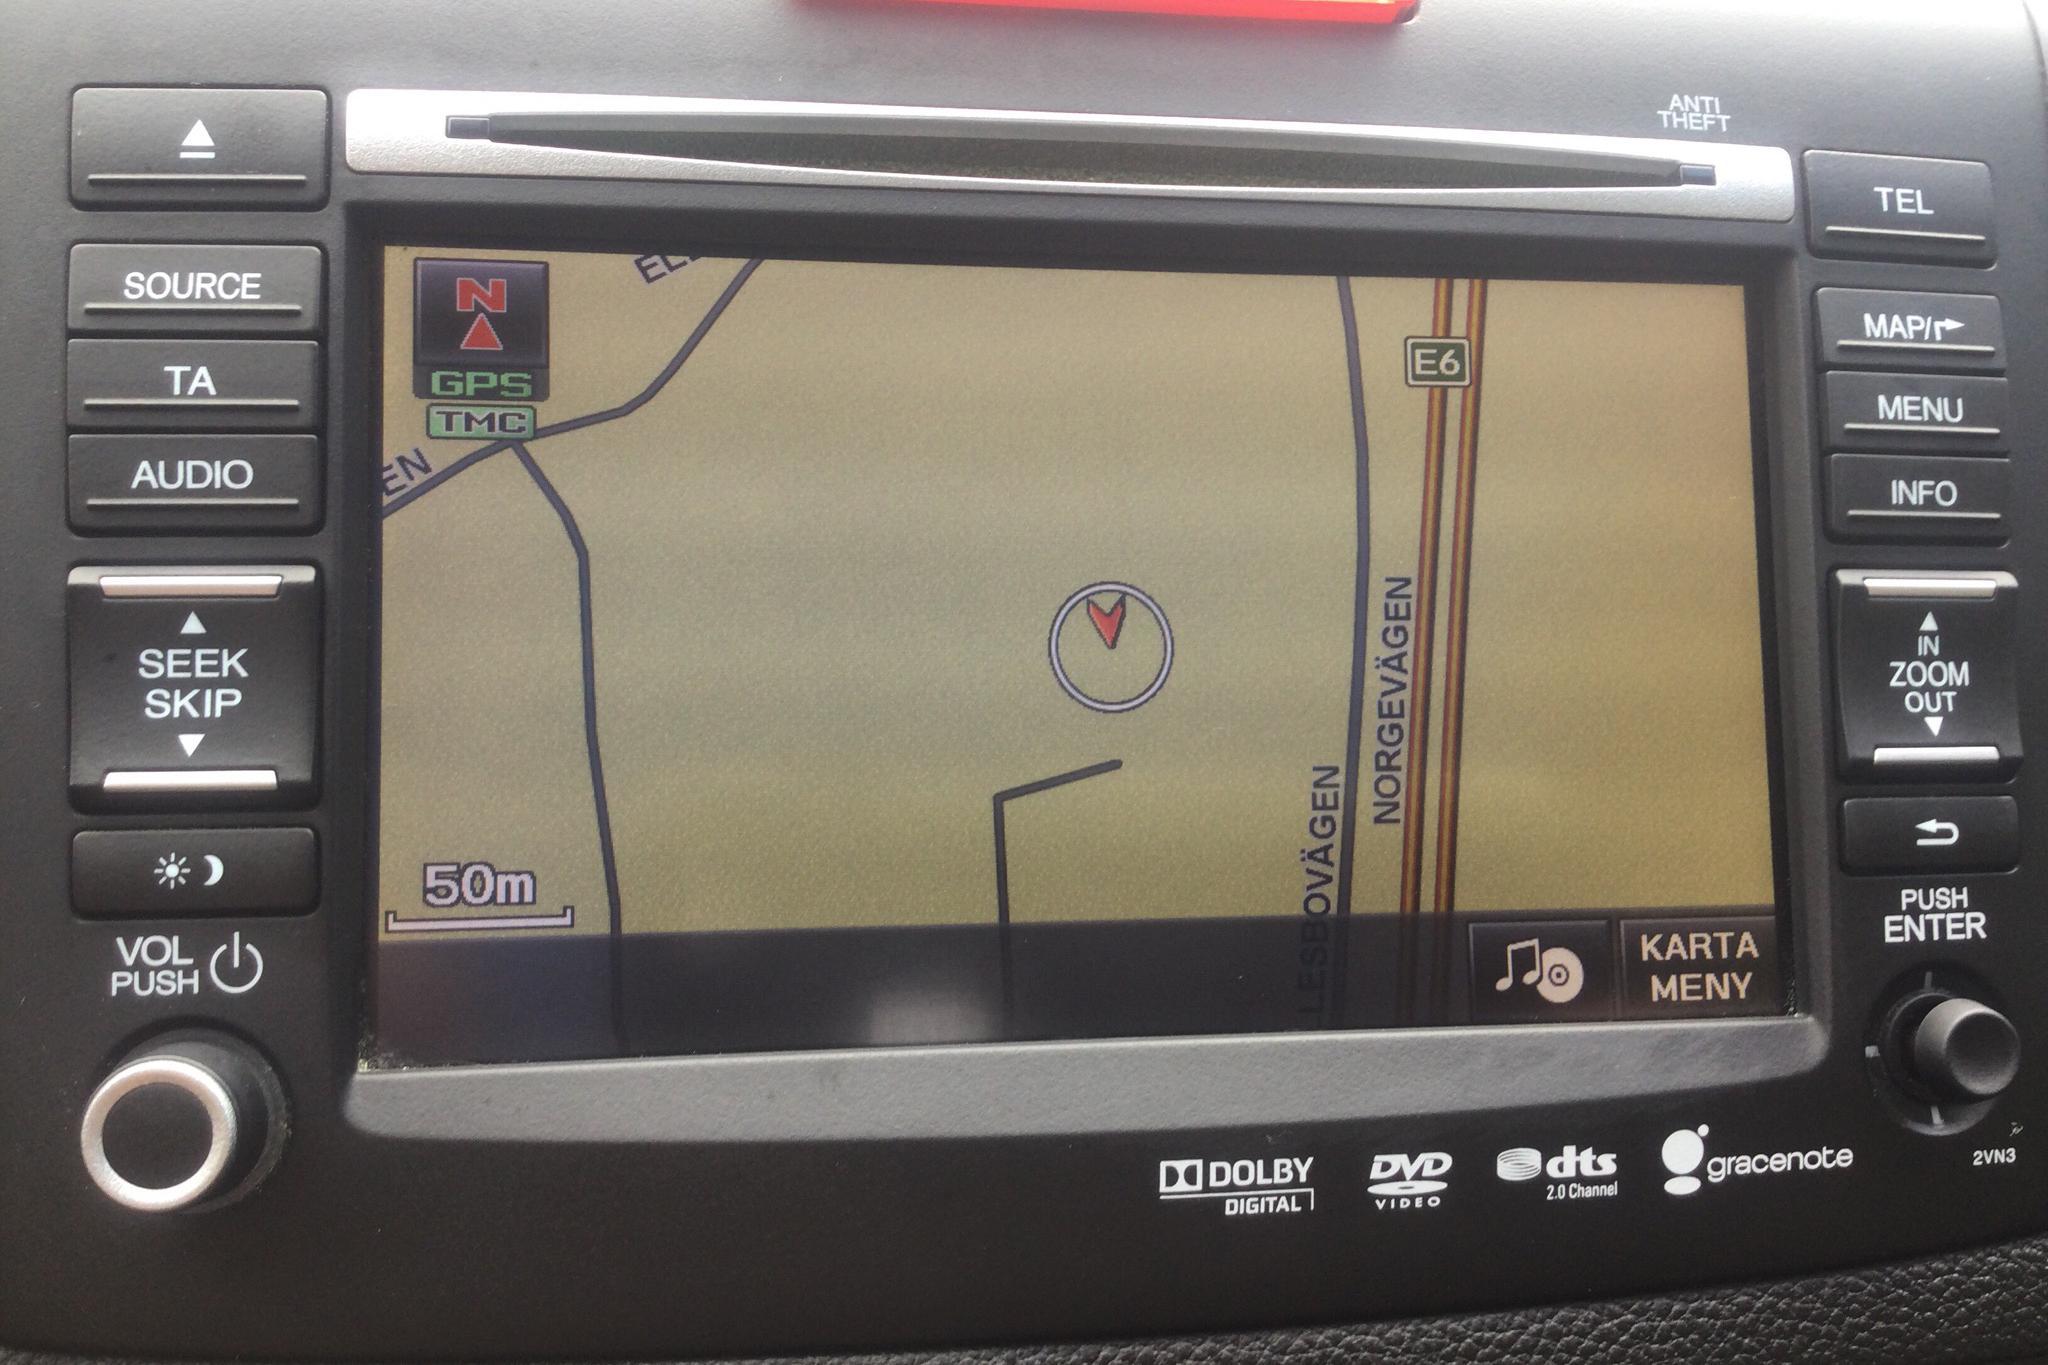 Honda CR-V 2.2 i-DTEC 4WD (150hk) - 118 740 km - Automatic - red - 2013